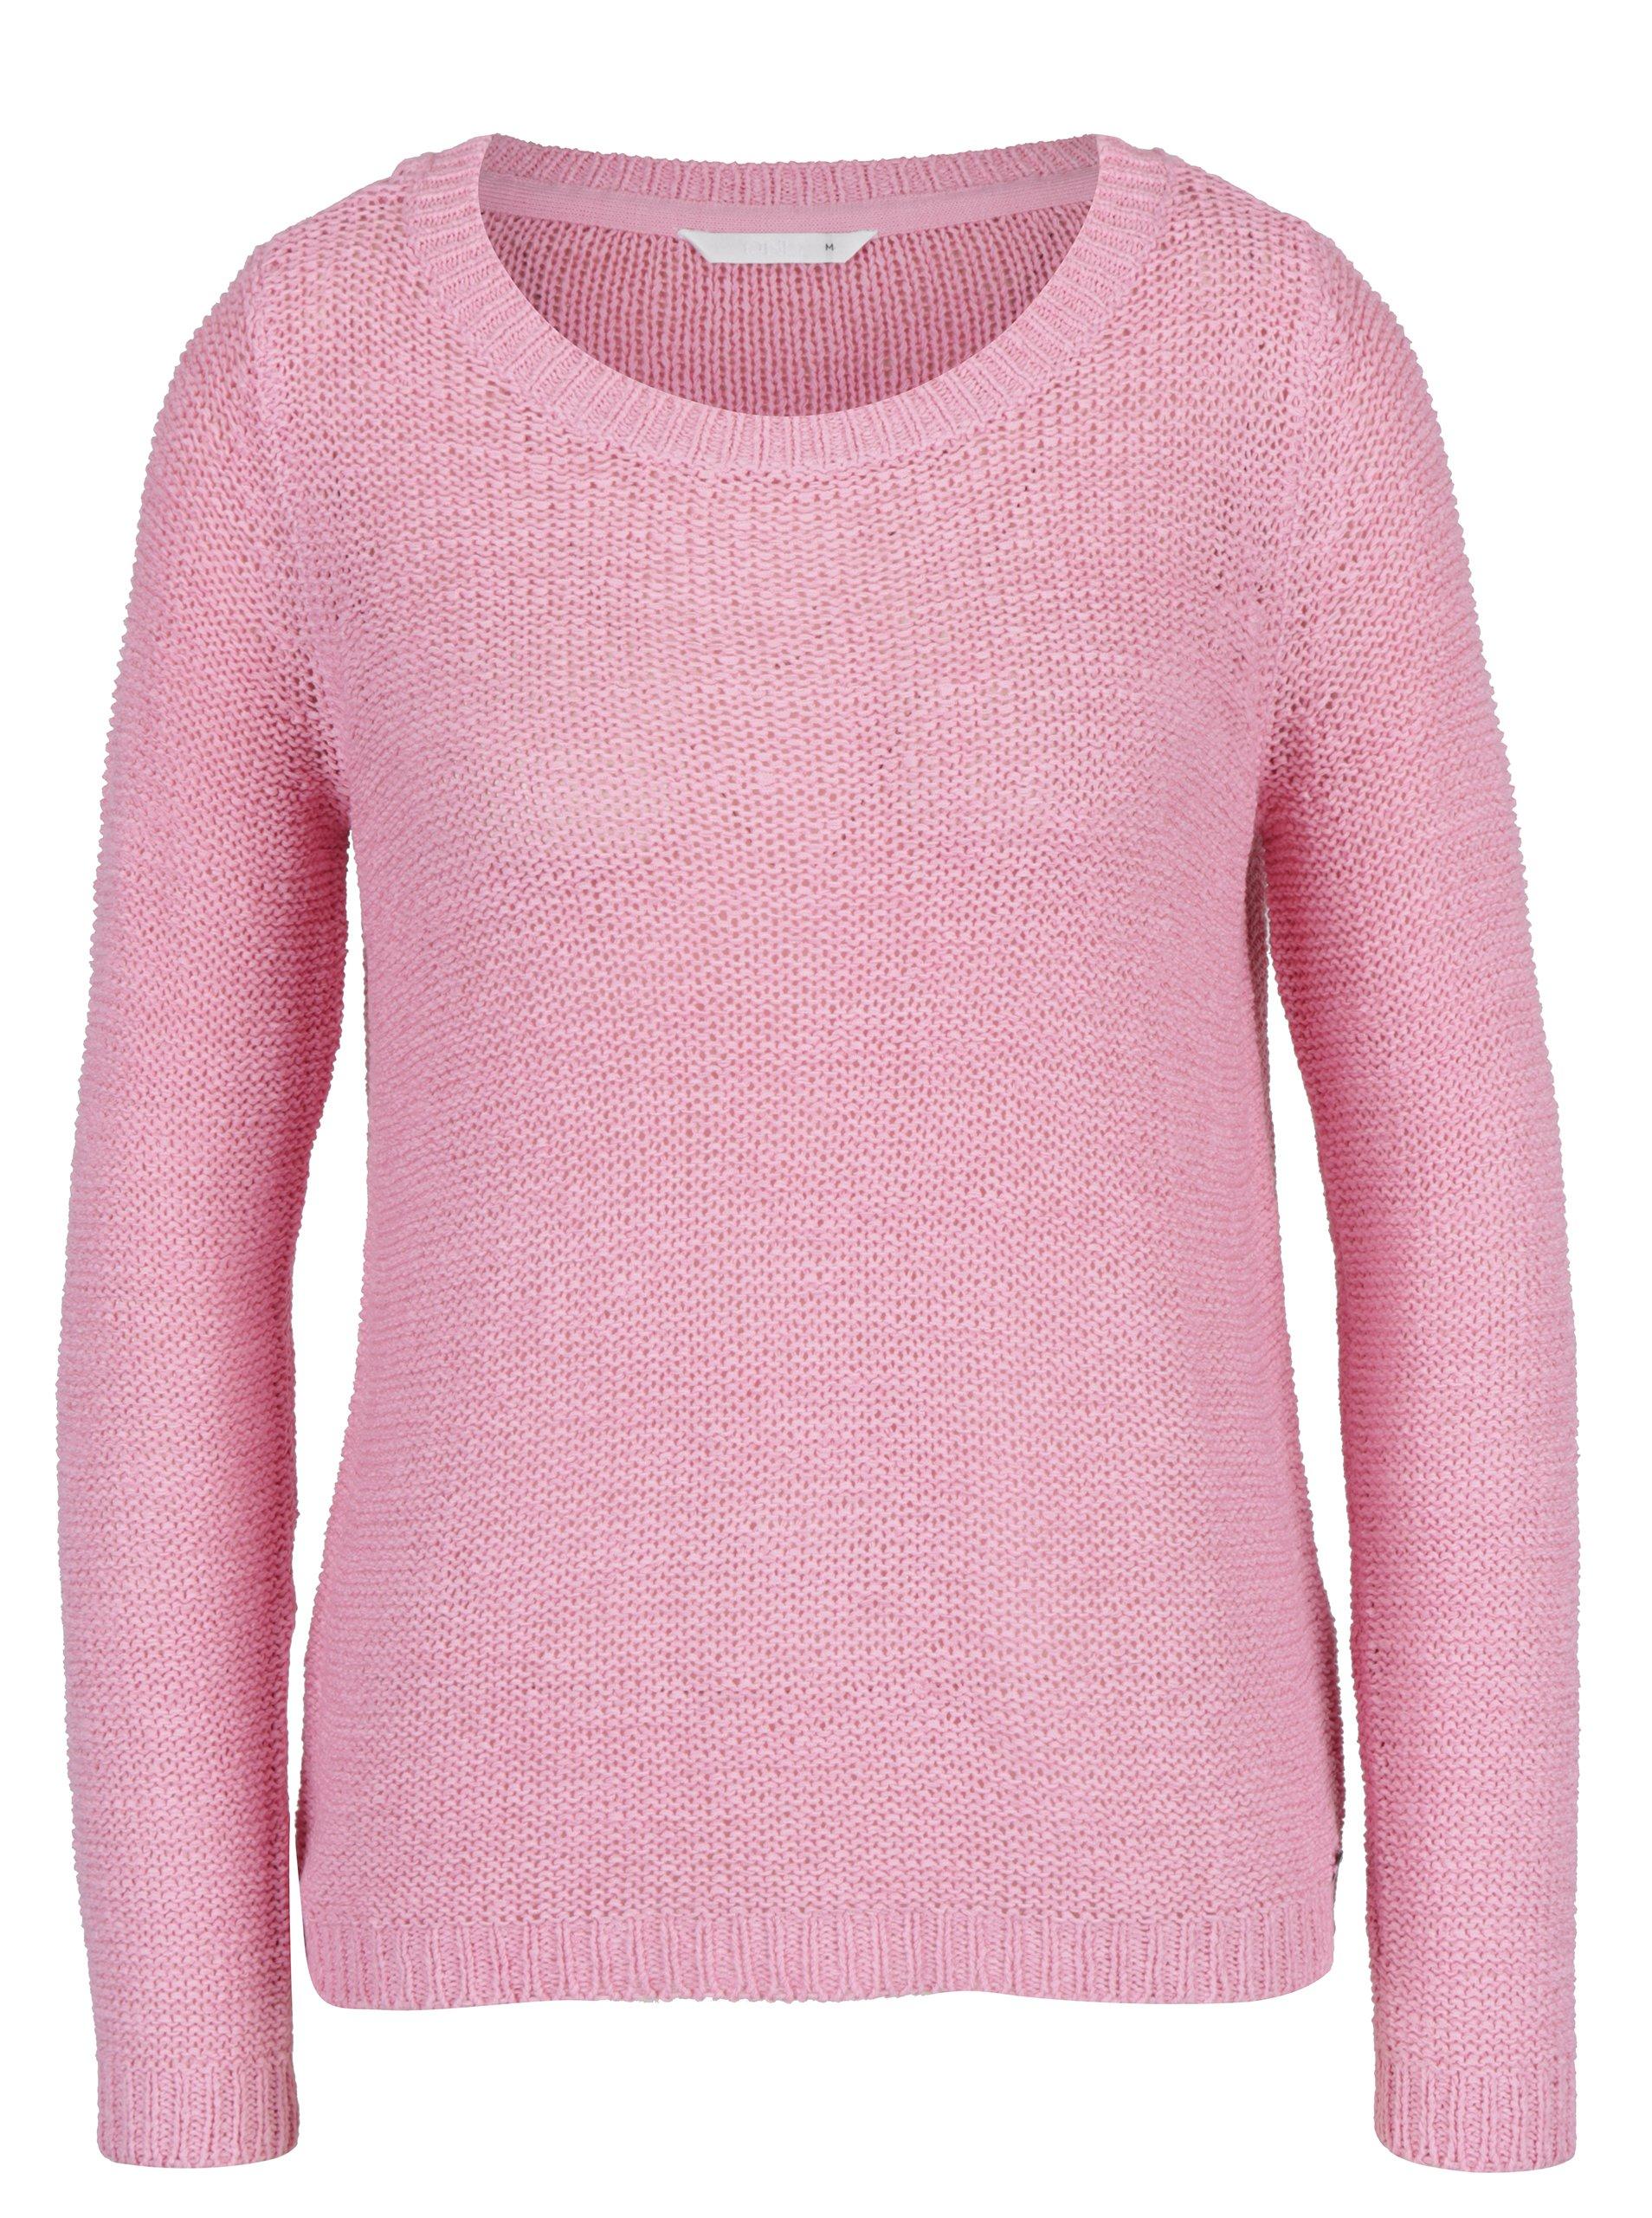 bedc4713dbc9 Ružový sveter ONLY Geena